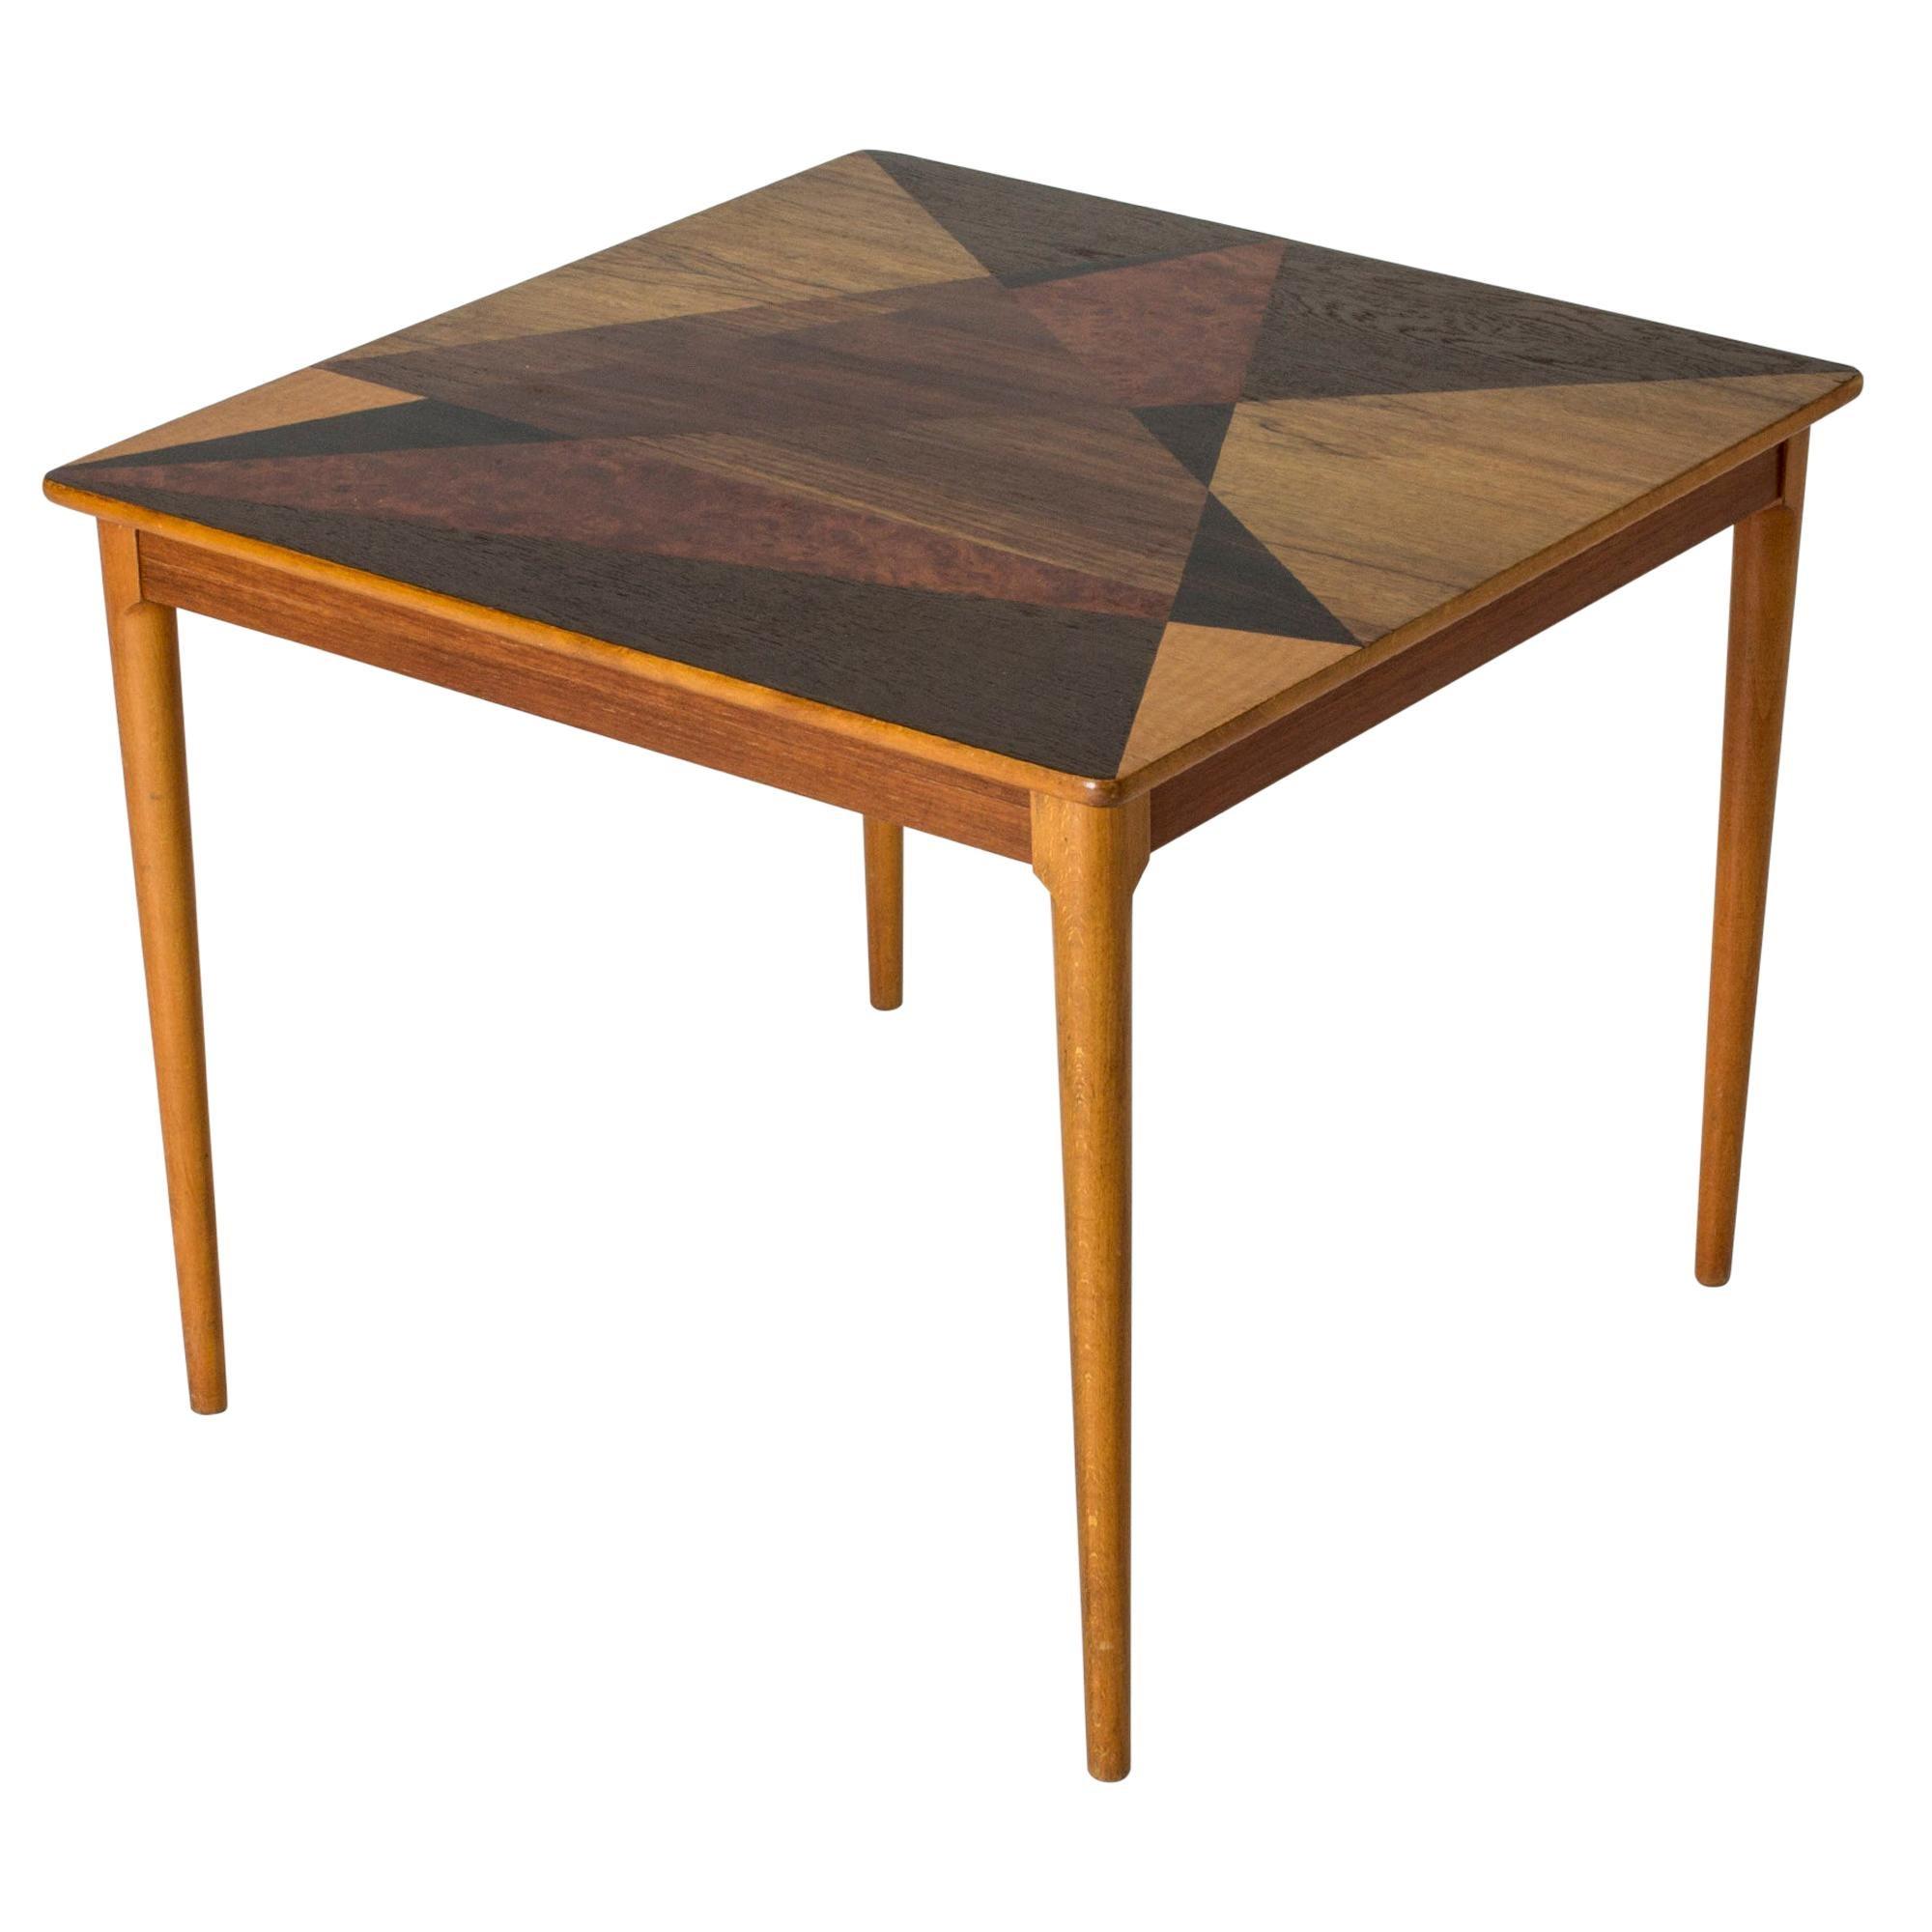 Swedish Midcentury Occasional Table